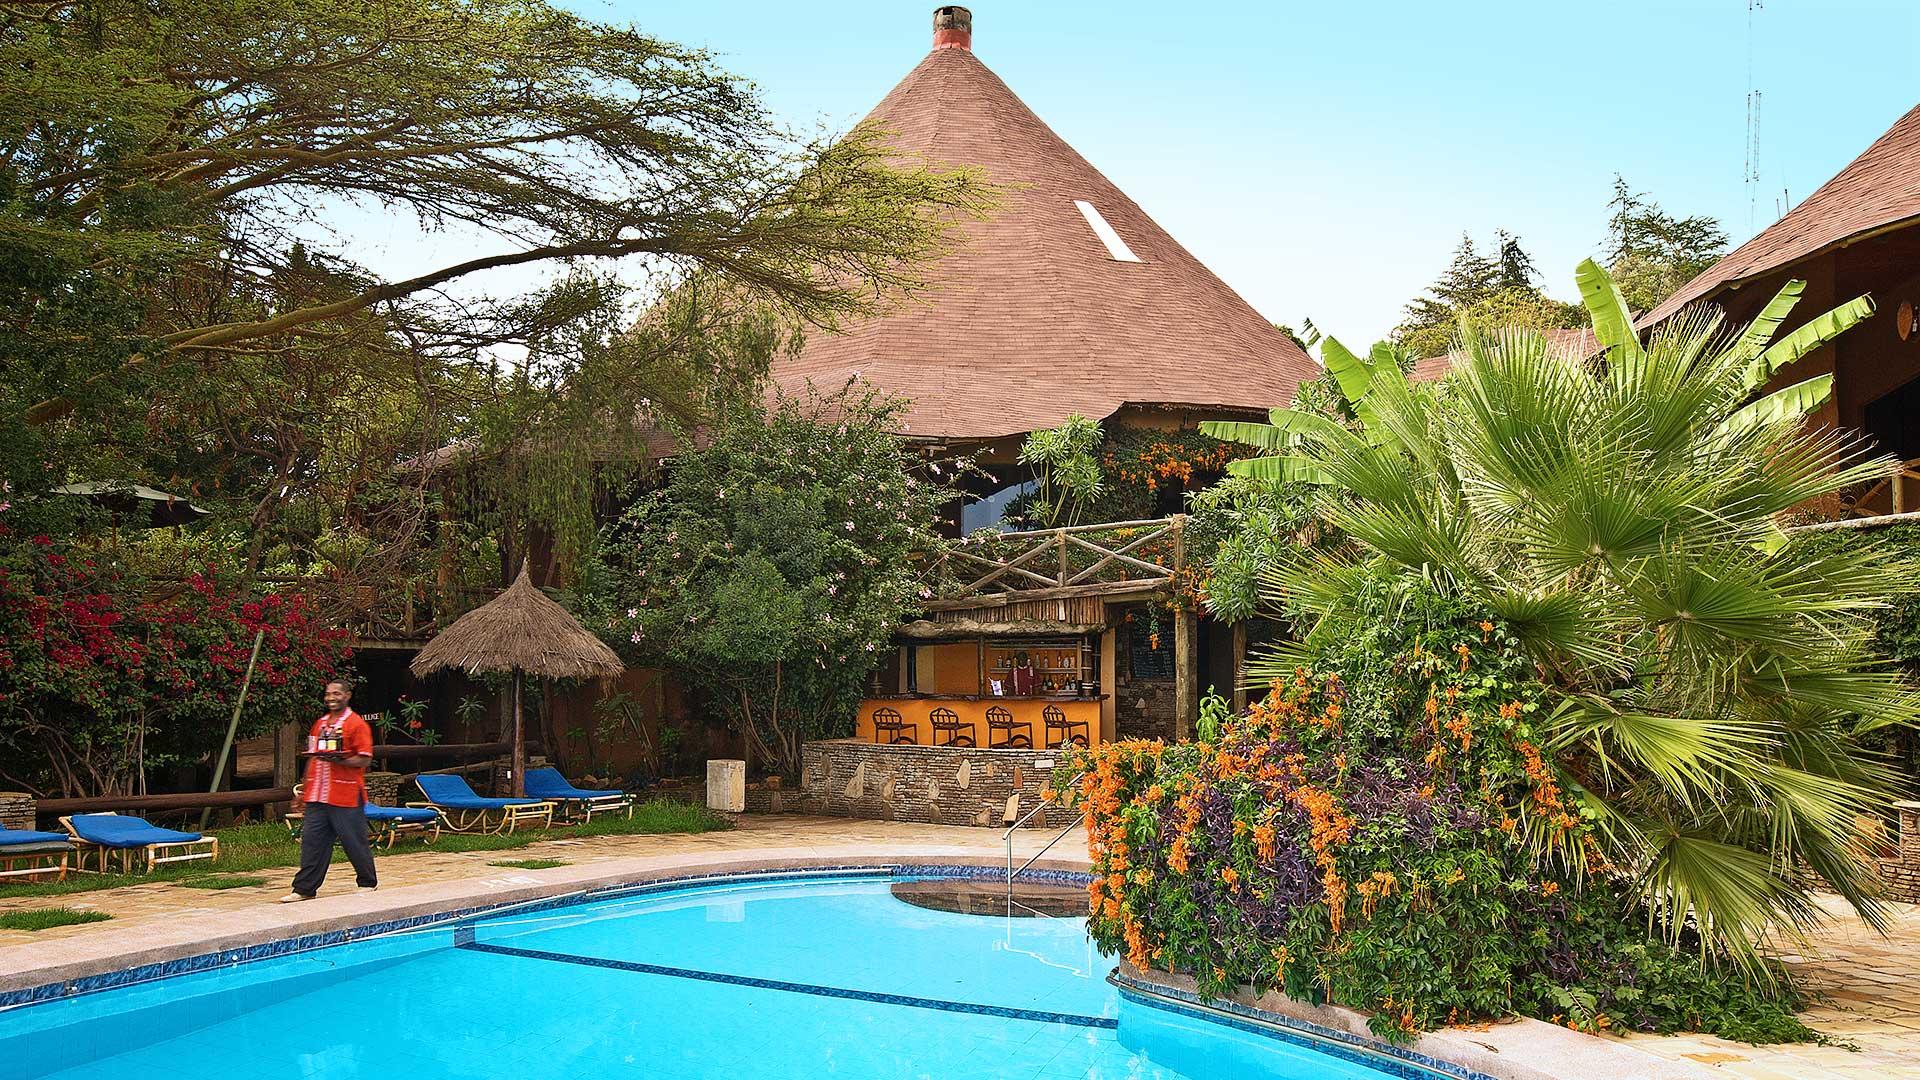 pool and lodge